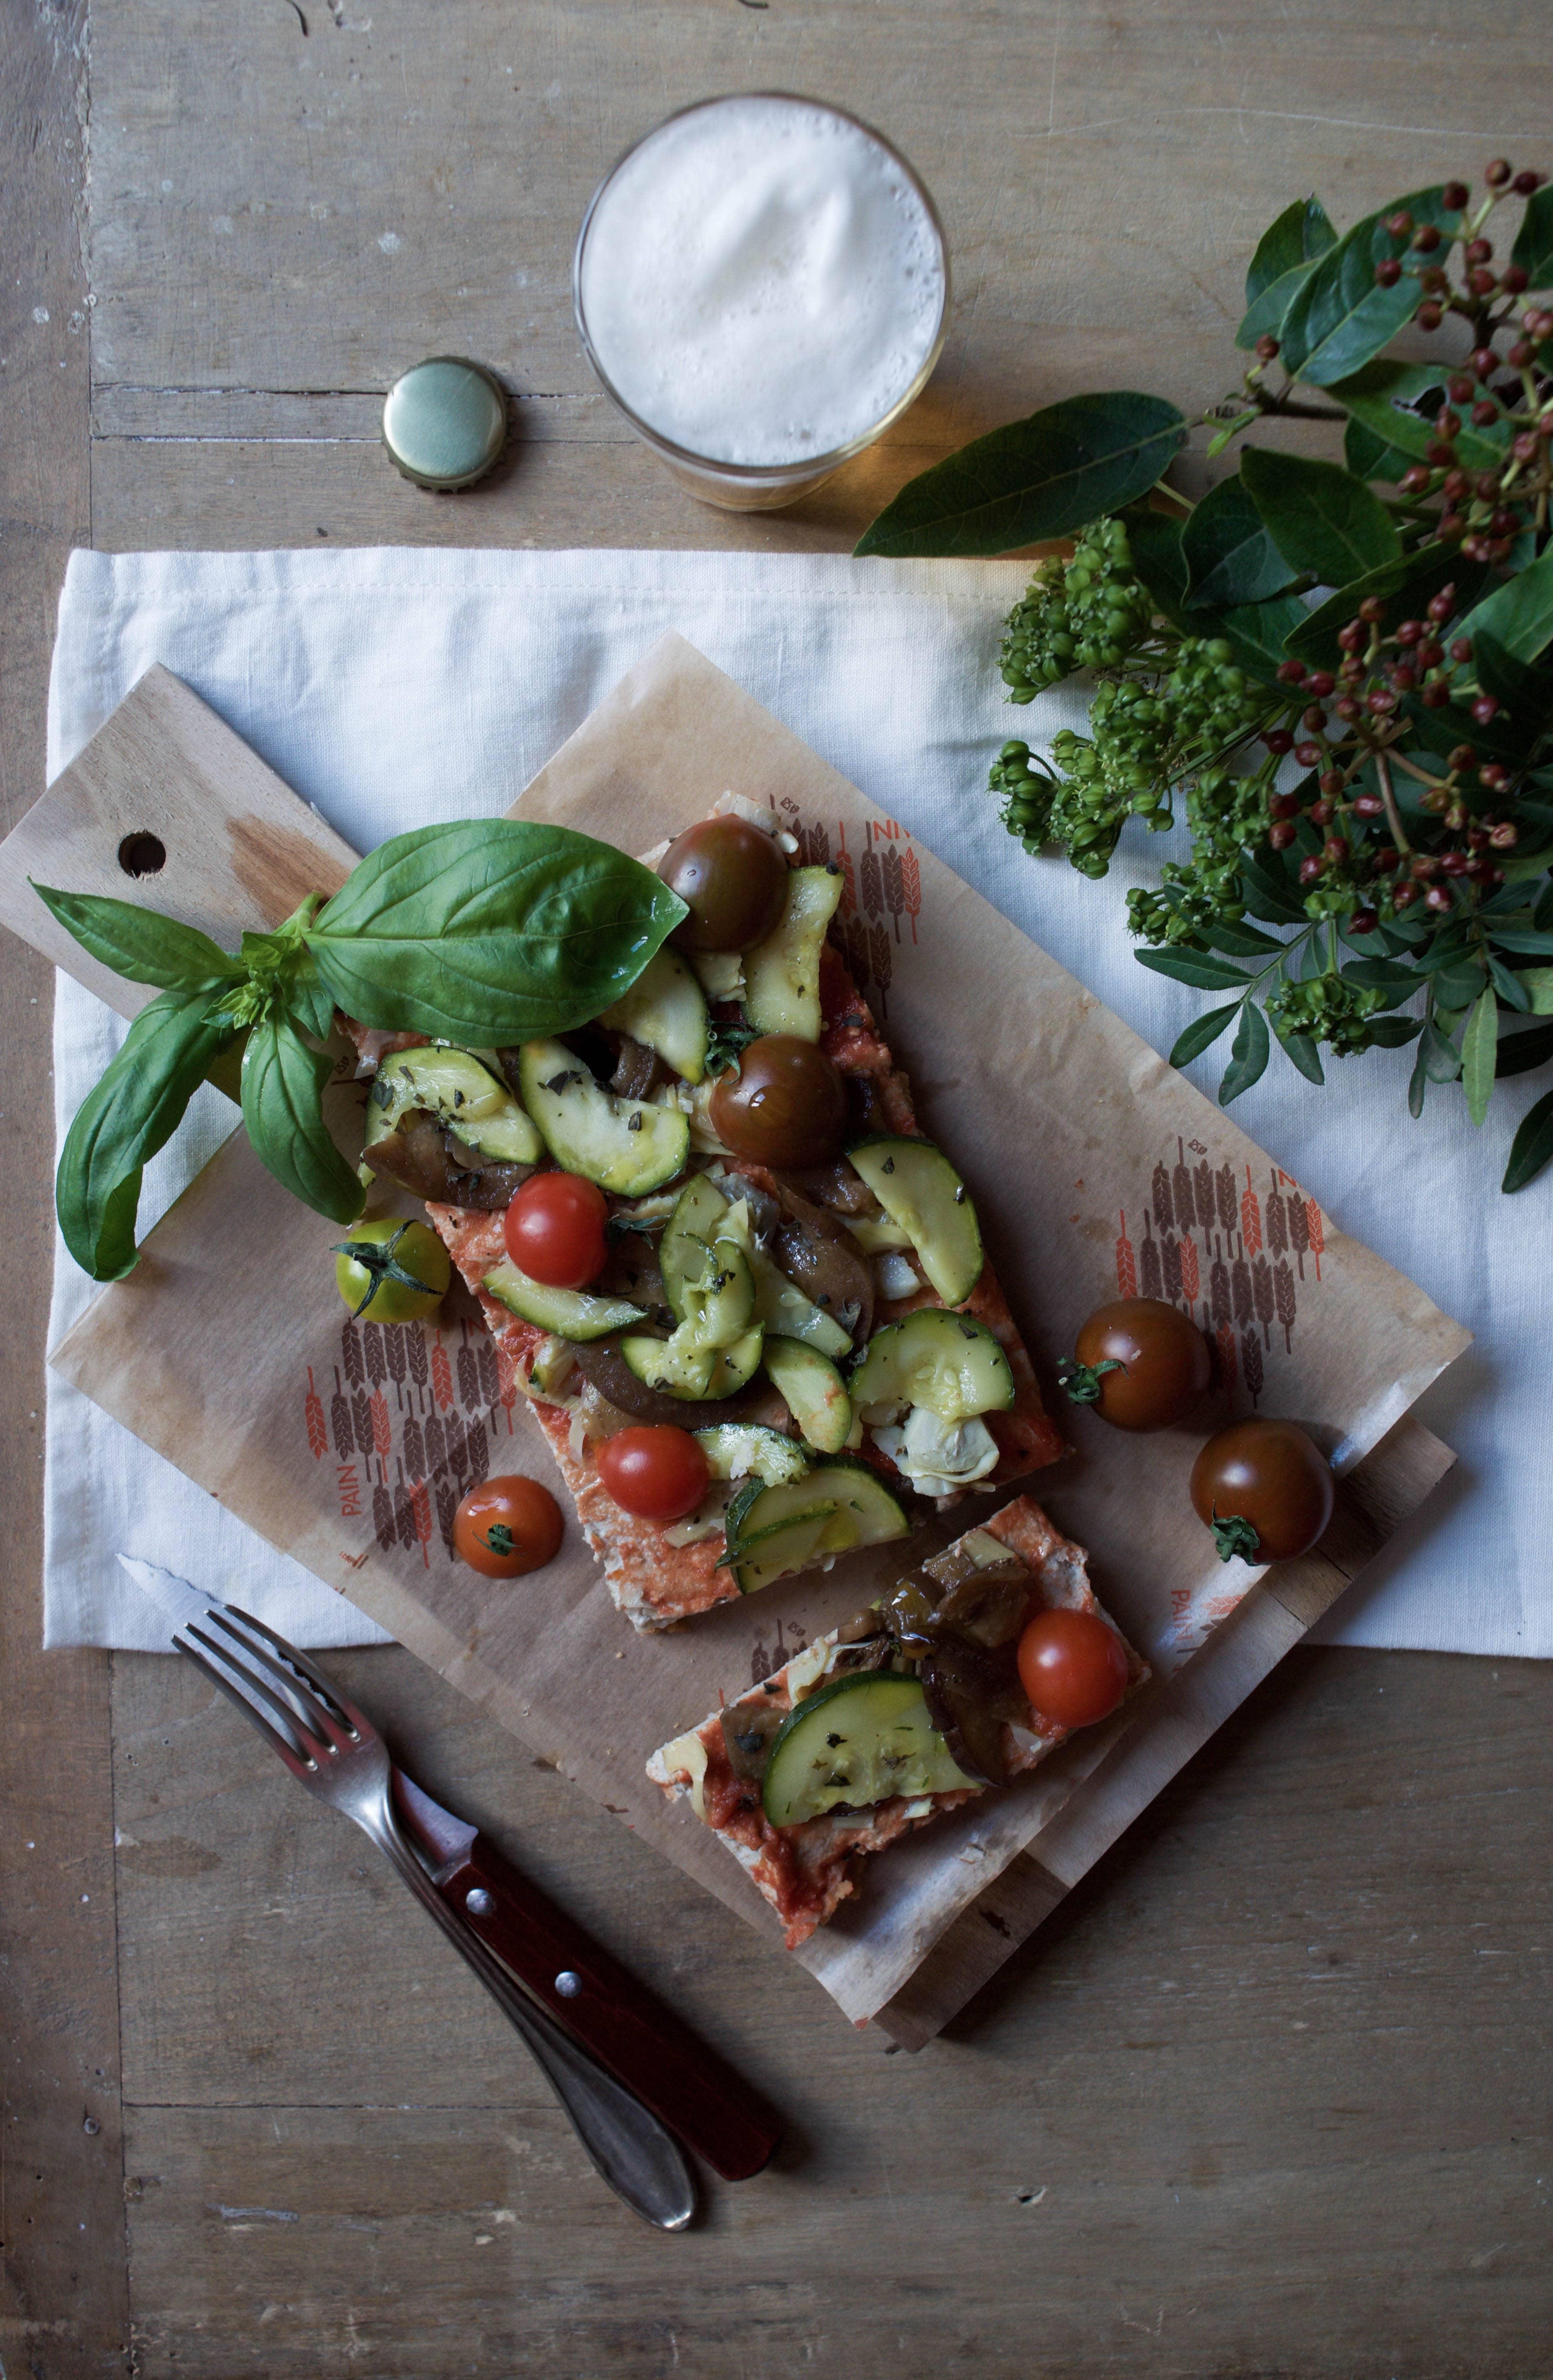 hank vegan and gluten free pizza in paris